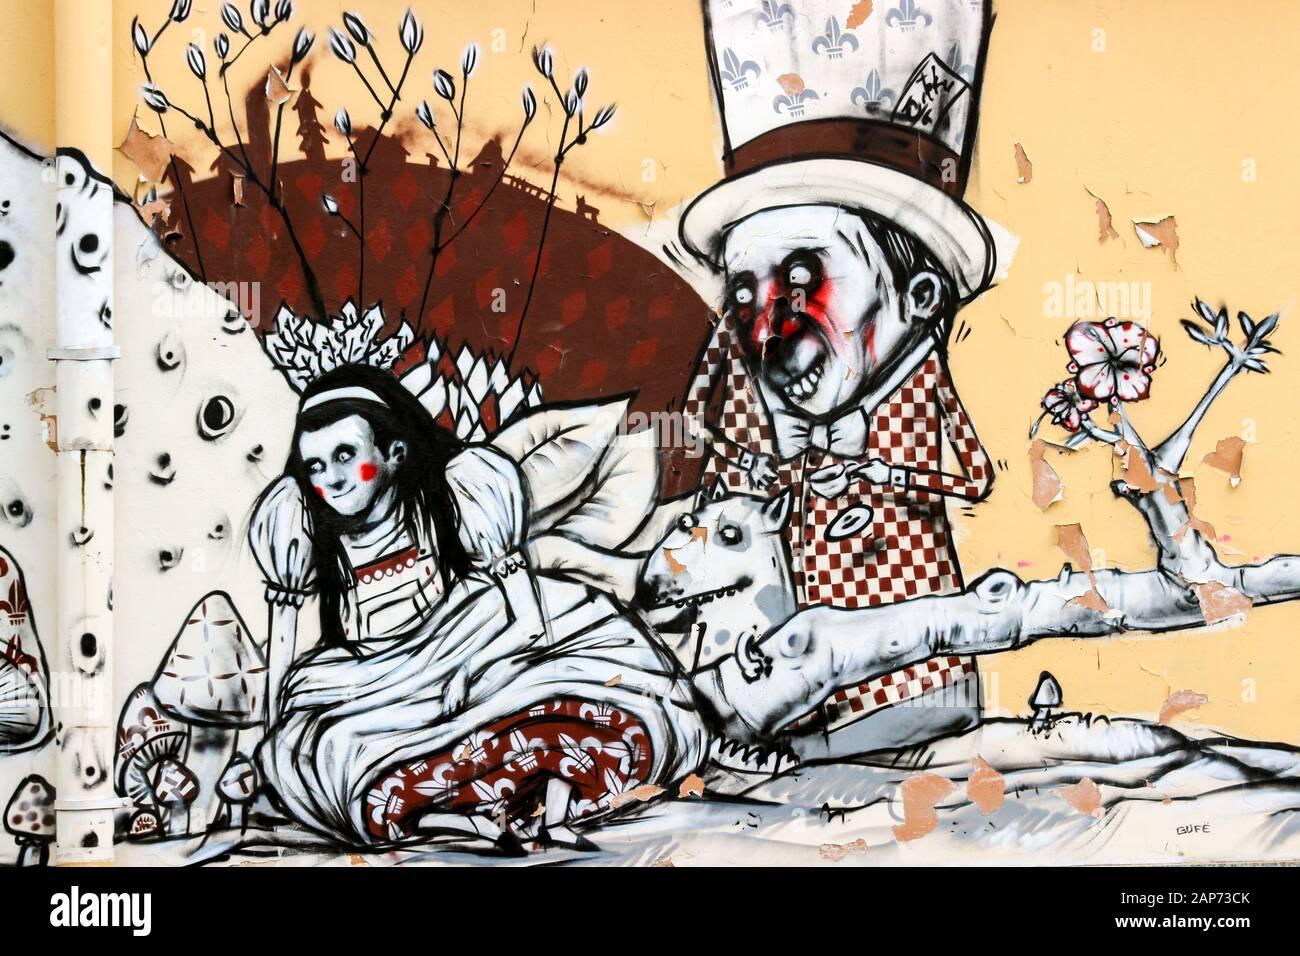 alice-in-wonderland-mural-on-kino-teatra